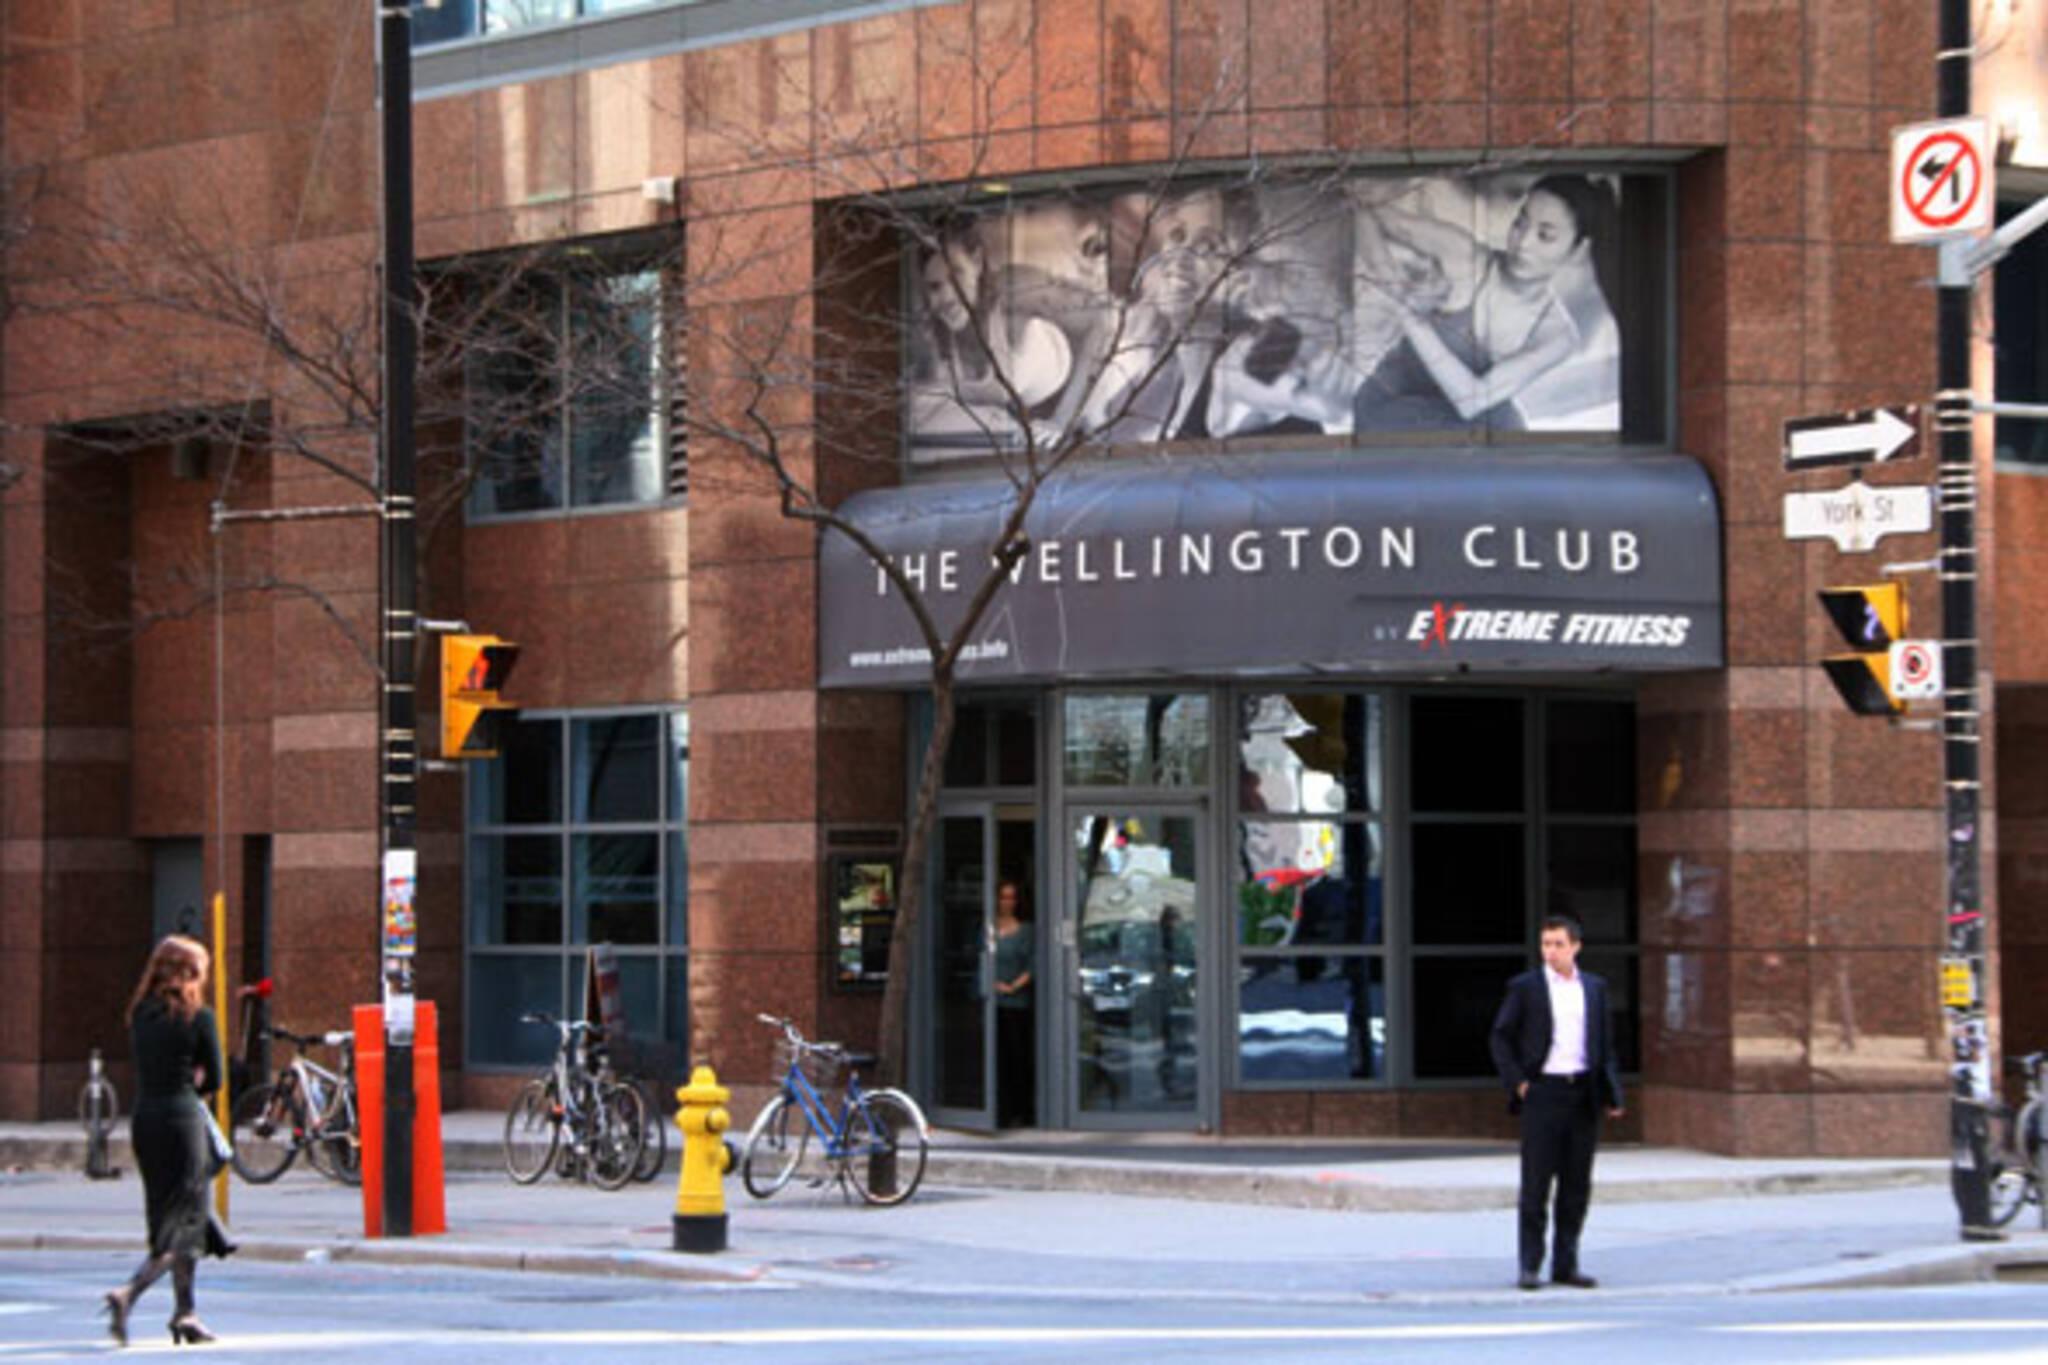 The Wellington Club